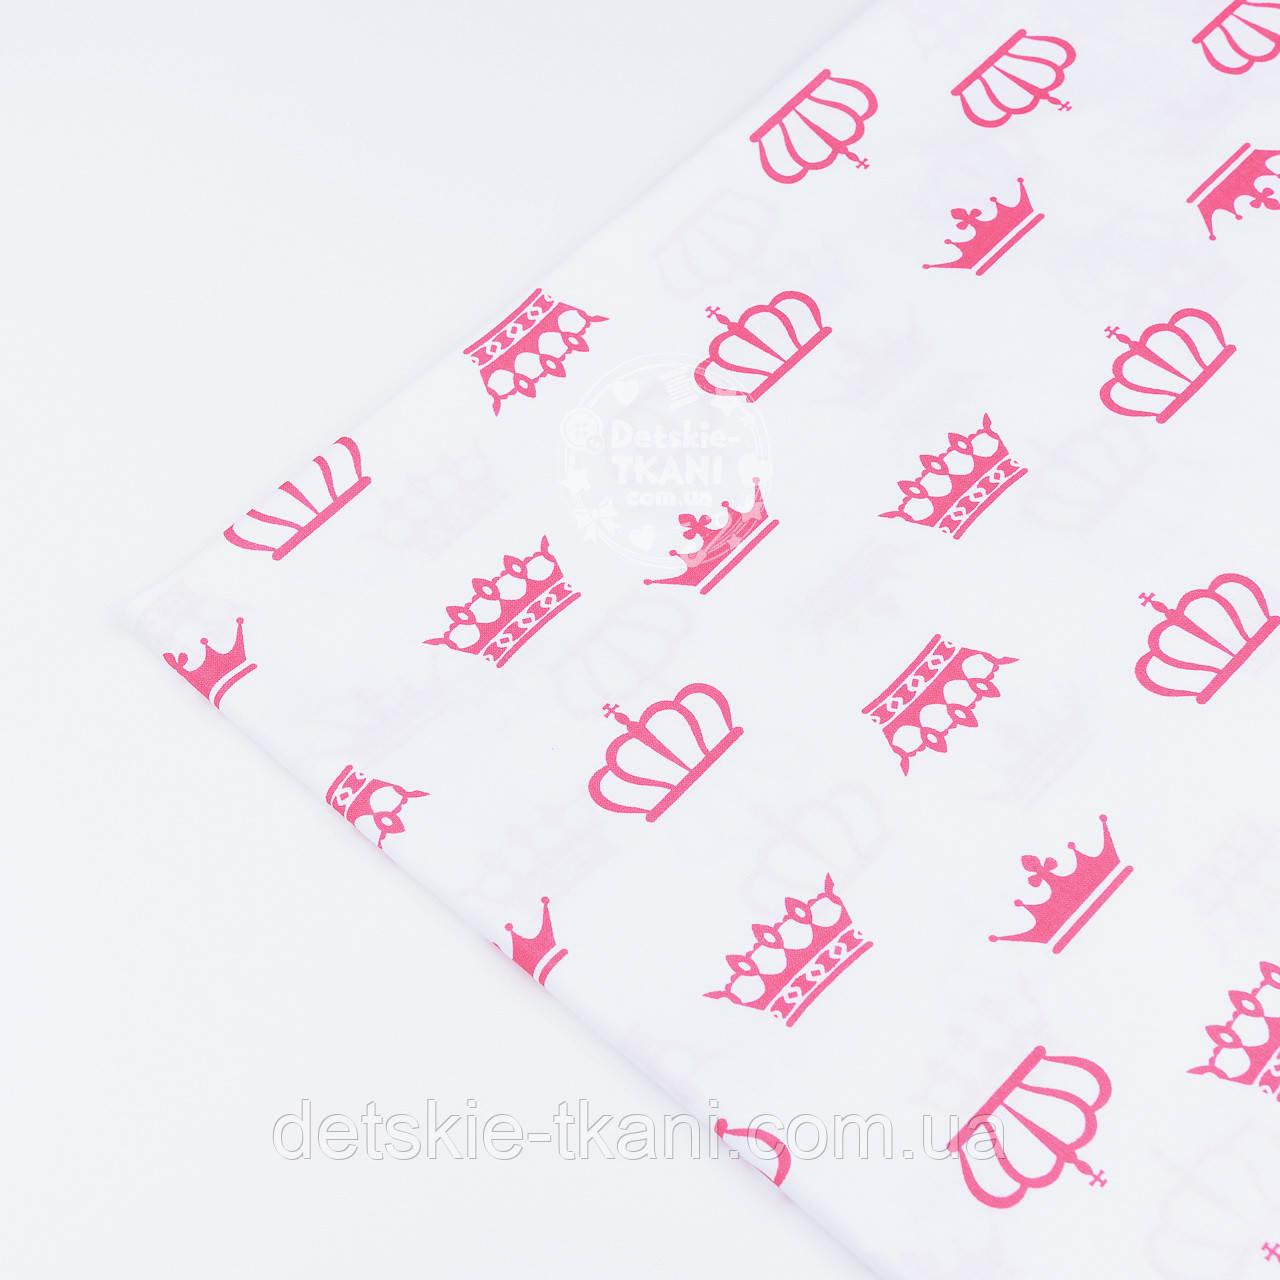 Лоскут ткани №1195а с малиновыми коронами белом фоне